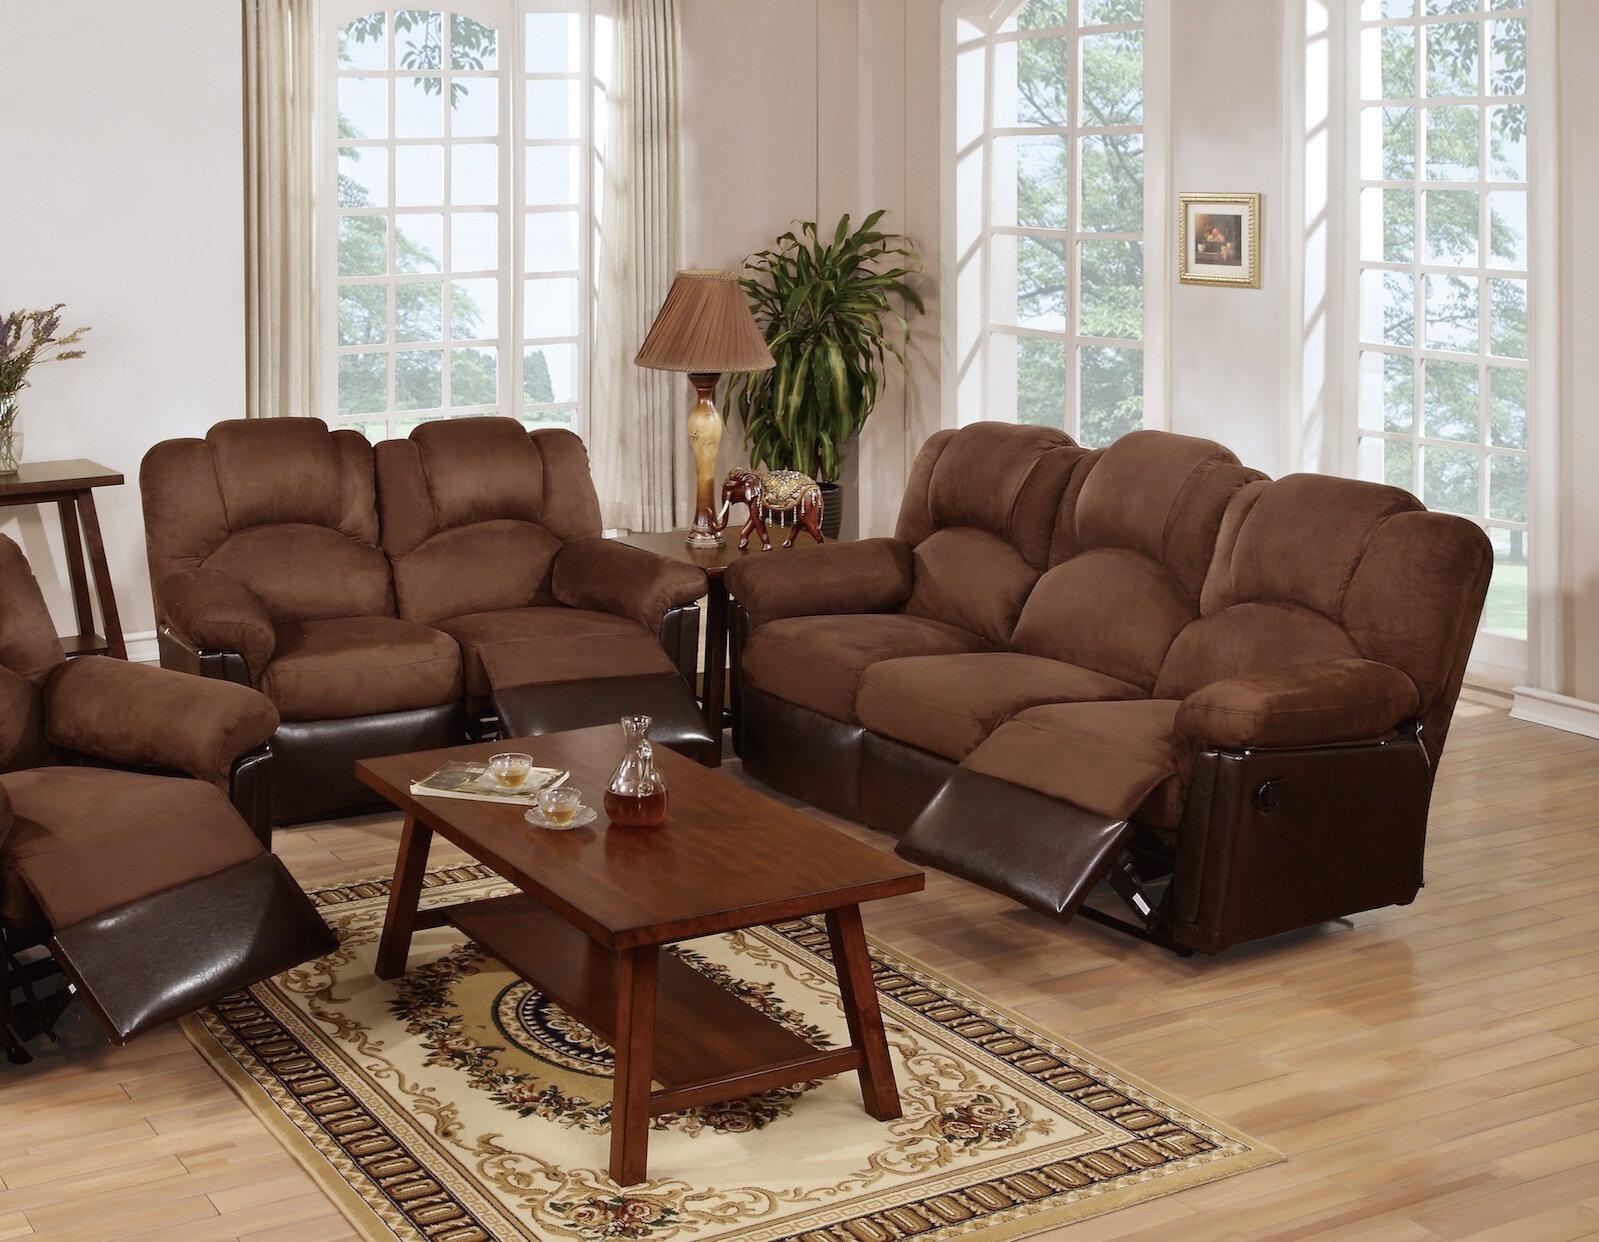 reclining living room sets Red Barrel Studio Ingaret Reclining Living Room Set & Reviews  reclining living room sets